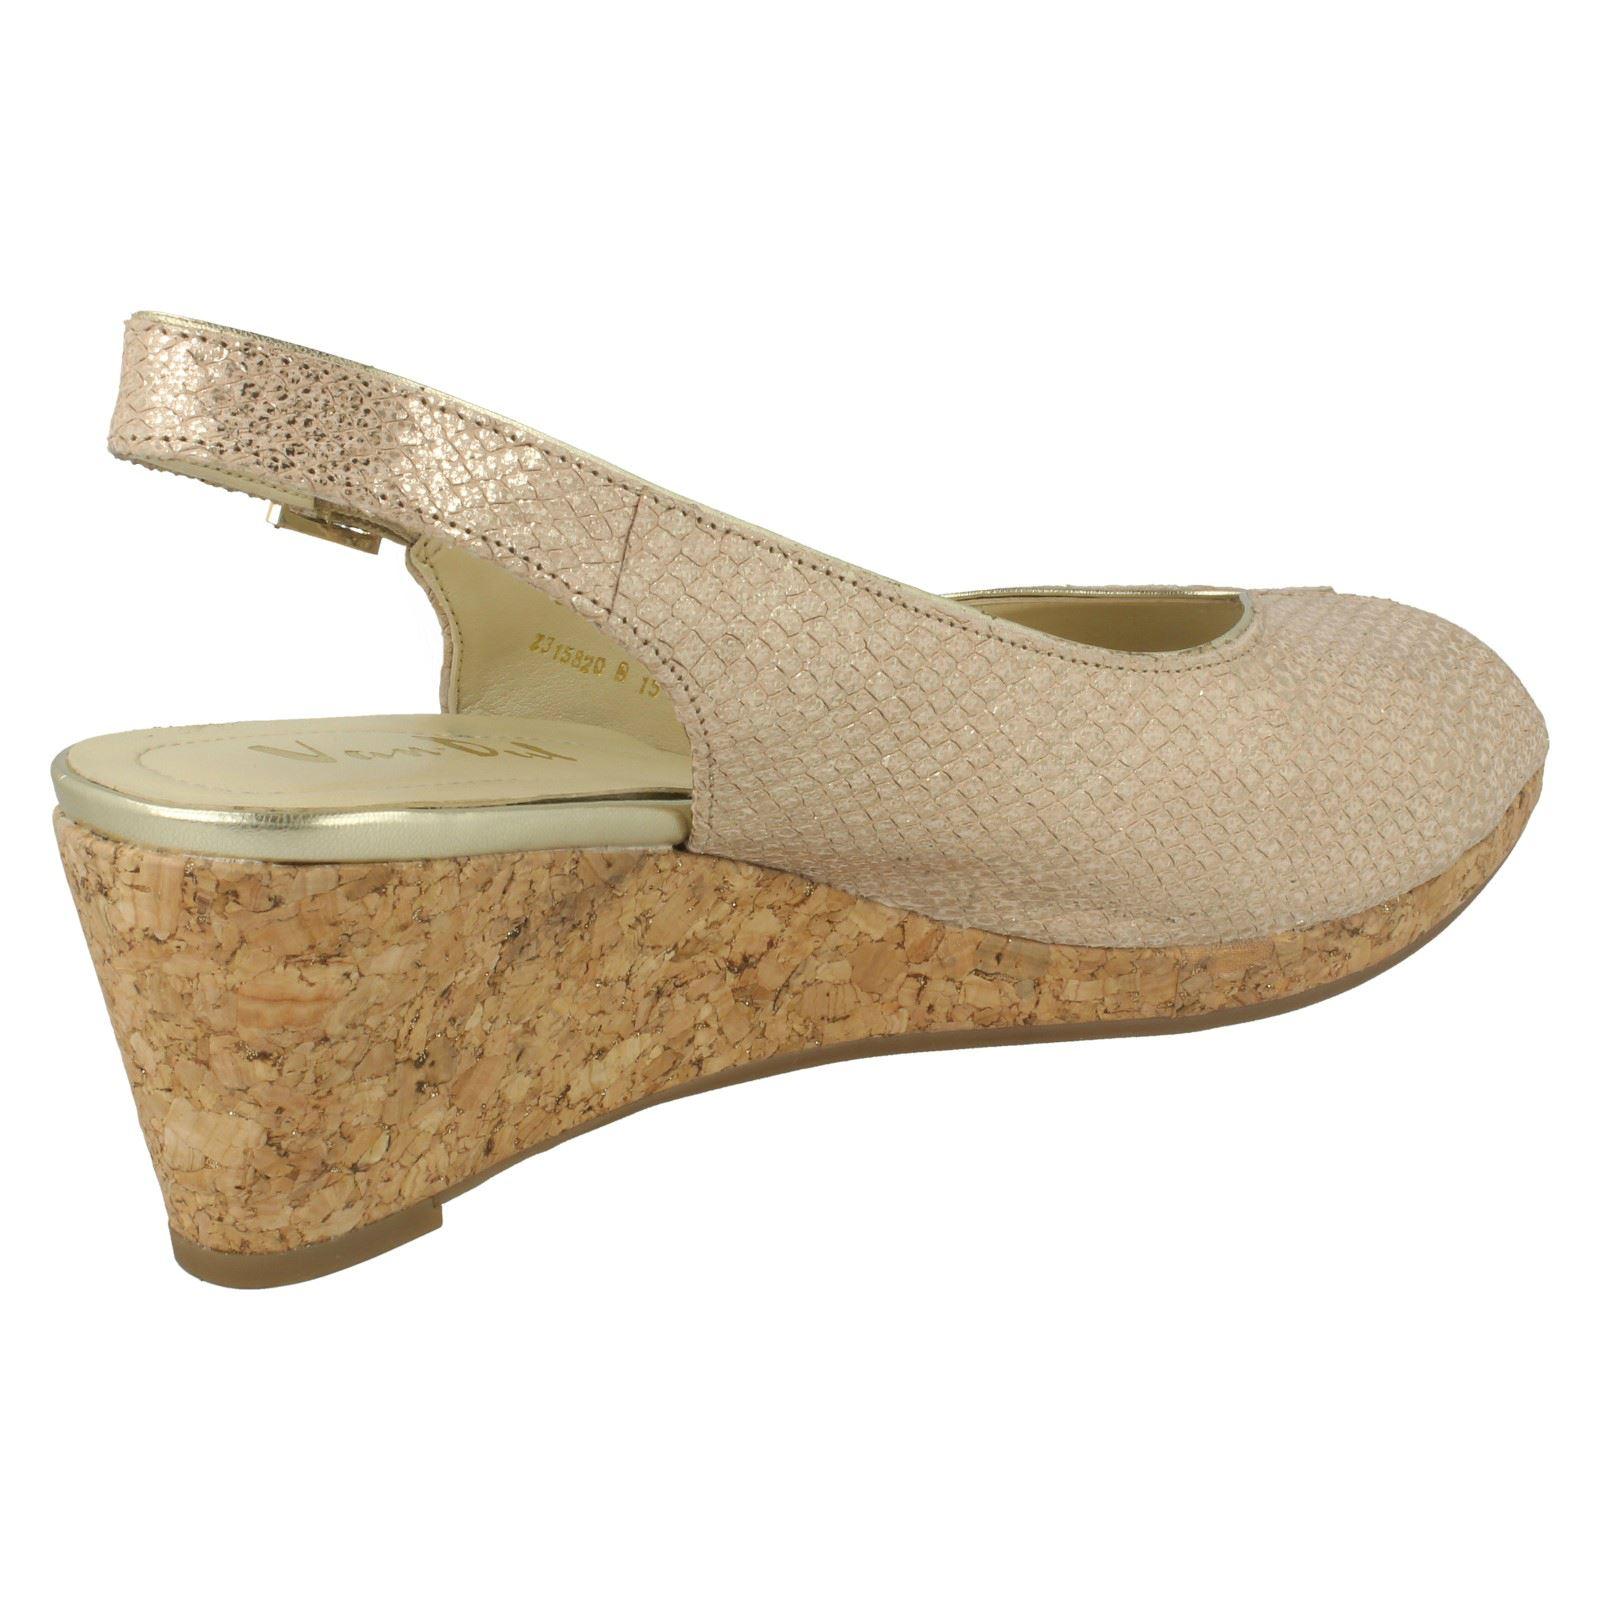 Ladies-Van-Dal-Cork-Wedge-Sandals-039-Gable-039 thumbnail 5